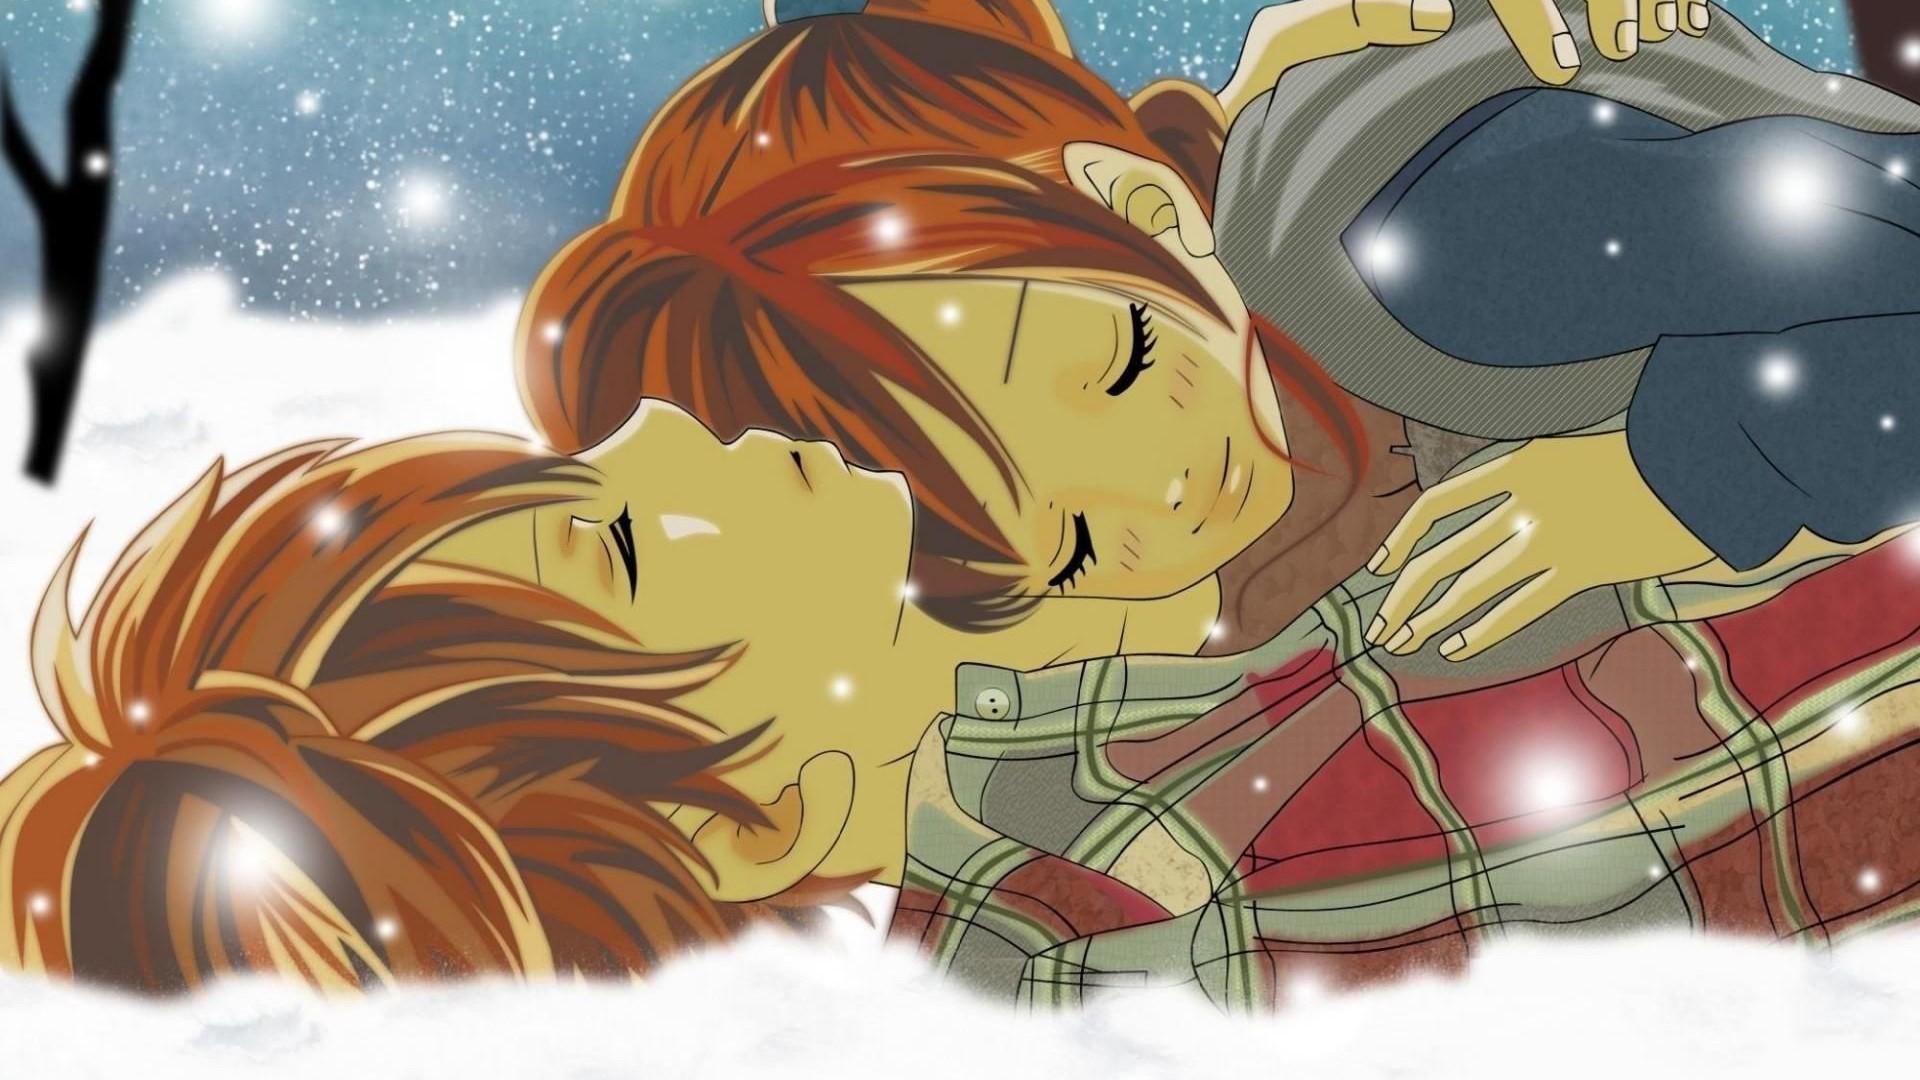 Romantic Love couples HD Wallpaper